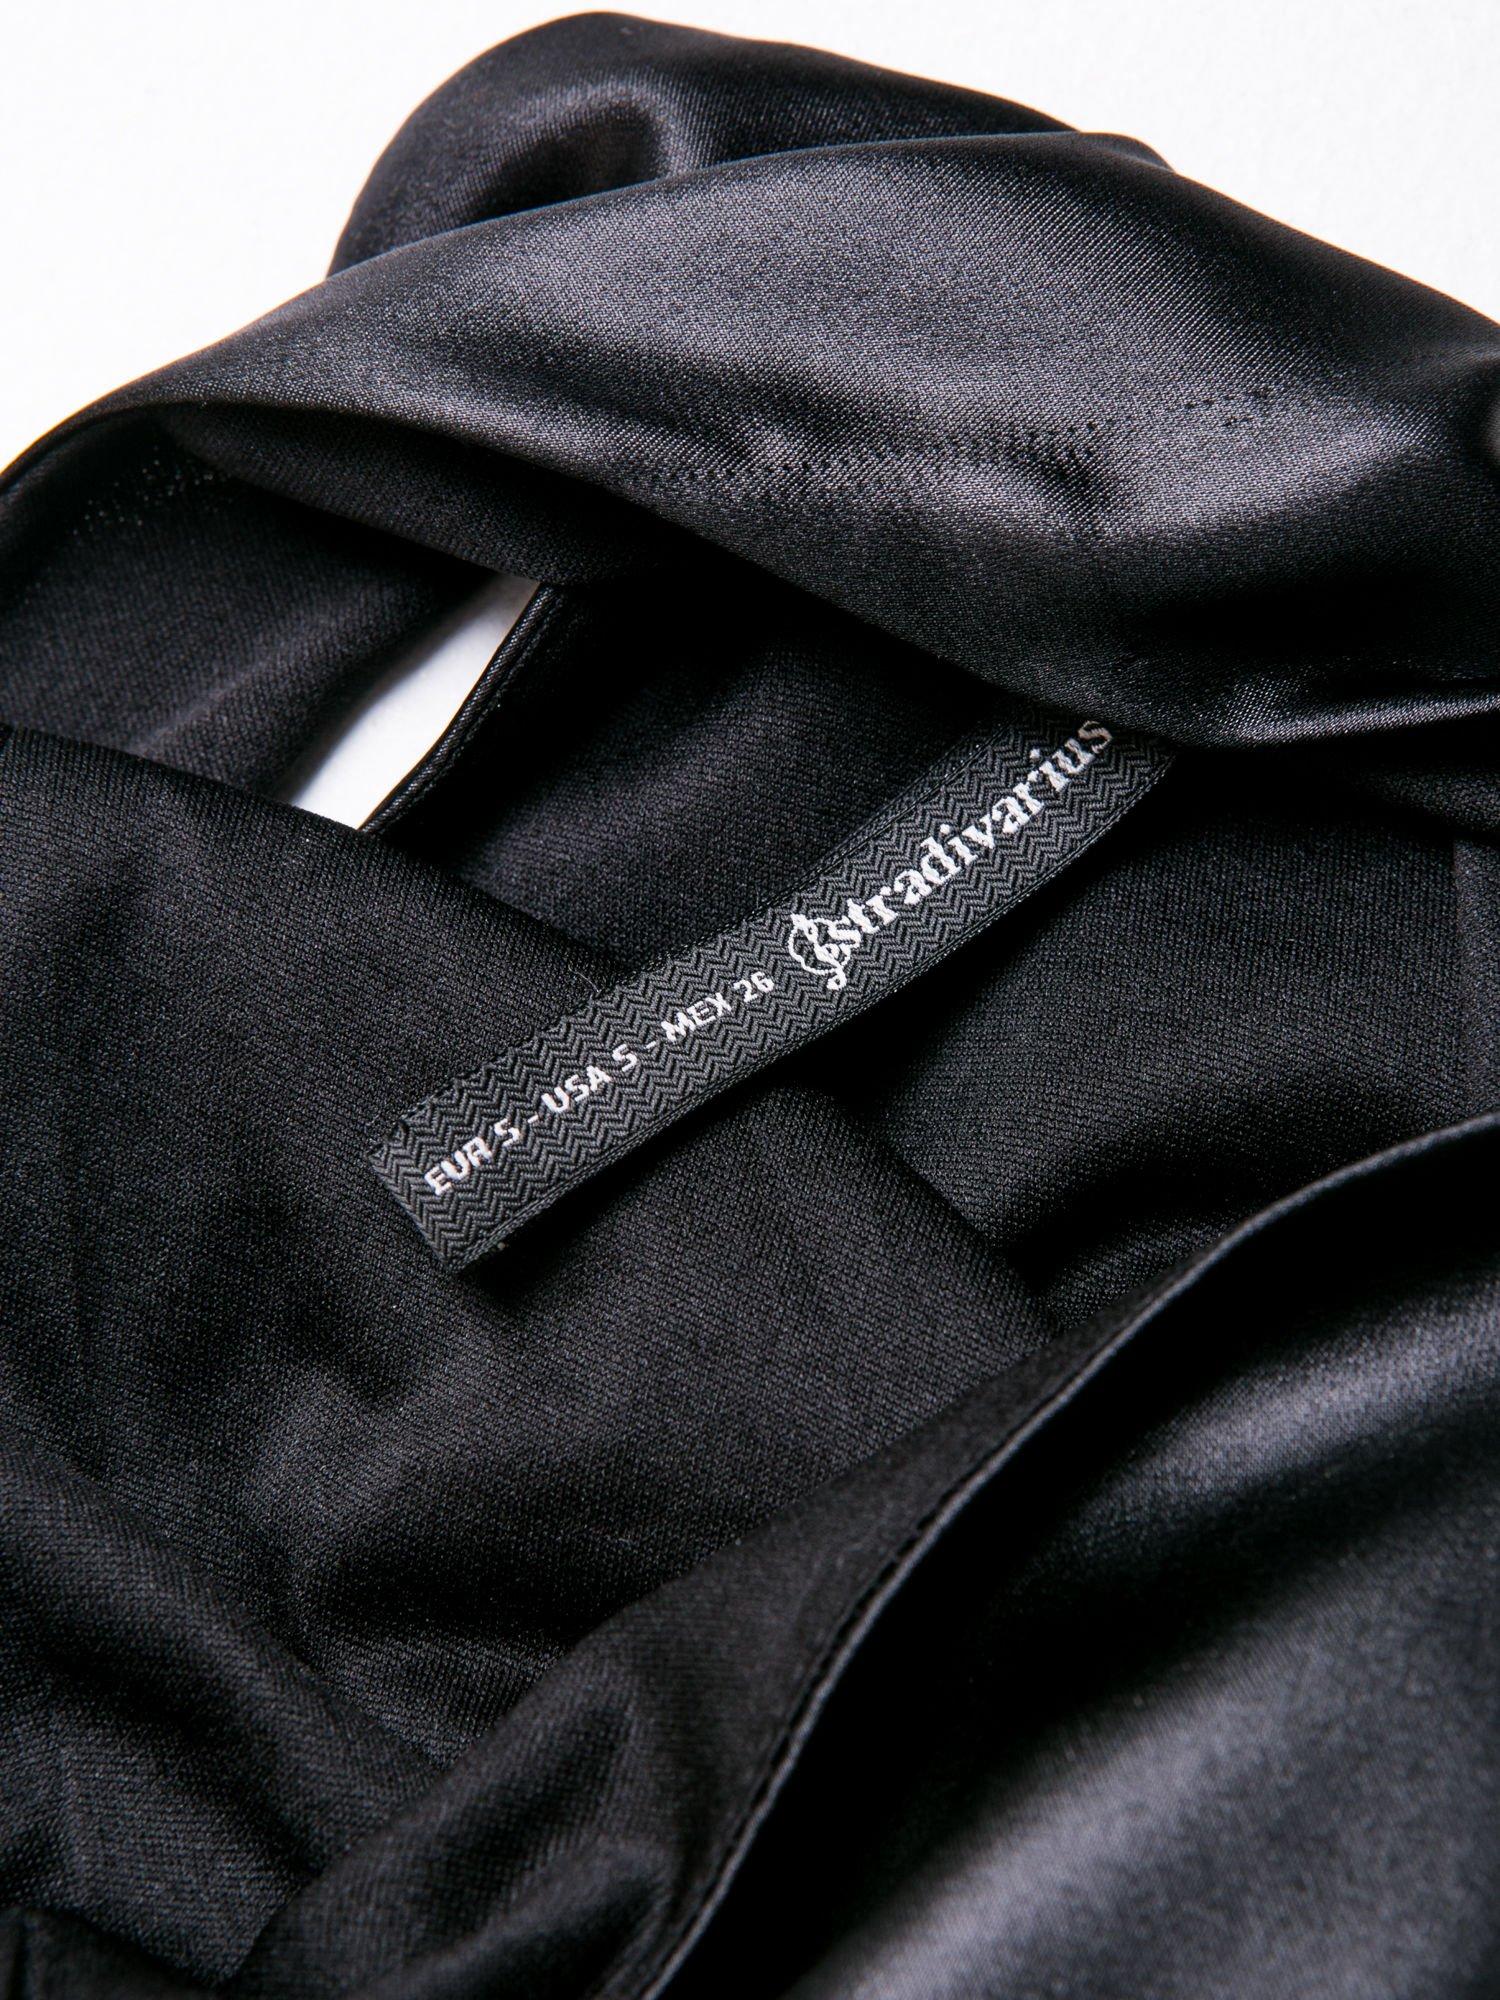 STRADIVARIUS Czarna skórzana sukienka na jedno ramię                                  zdj.                                  3